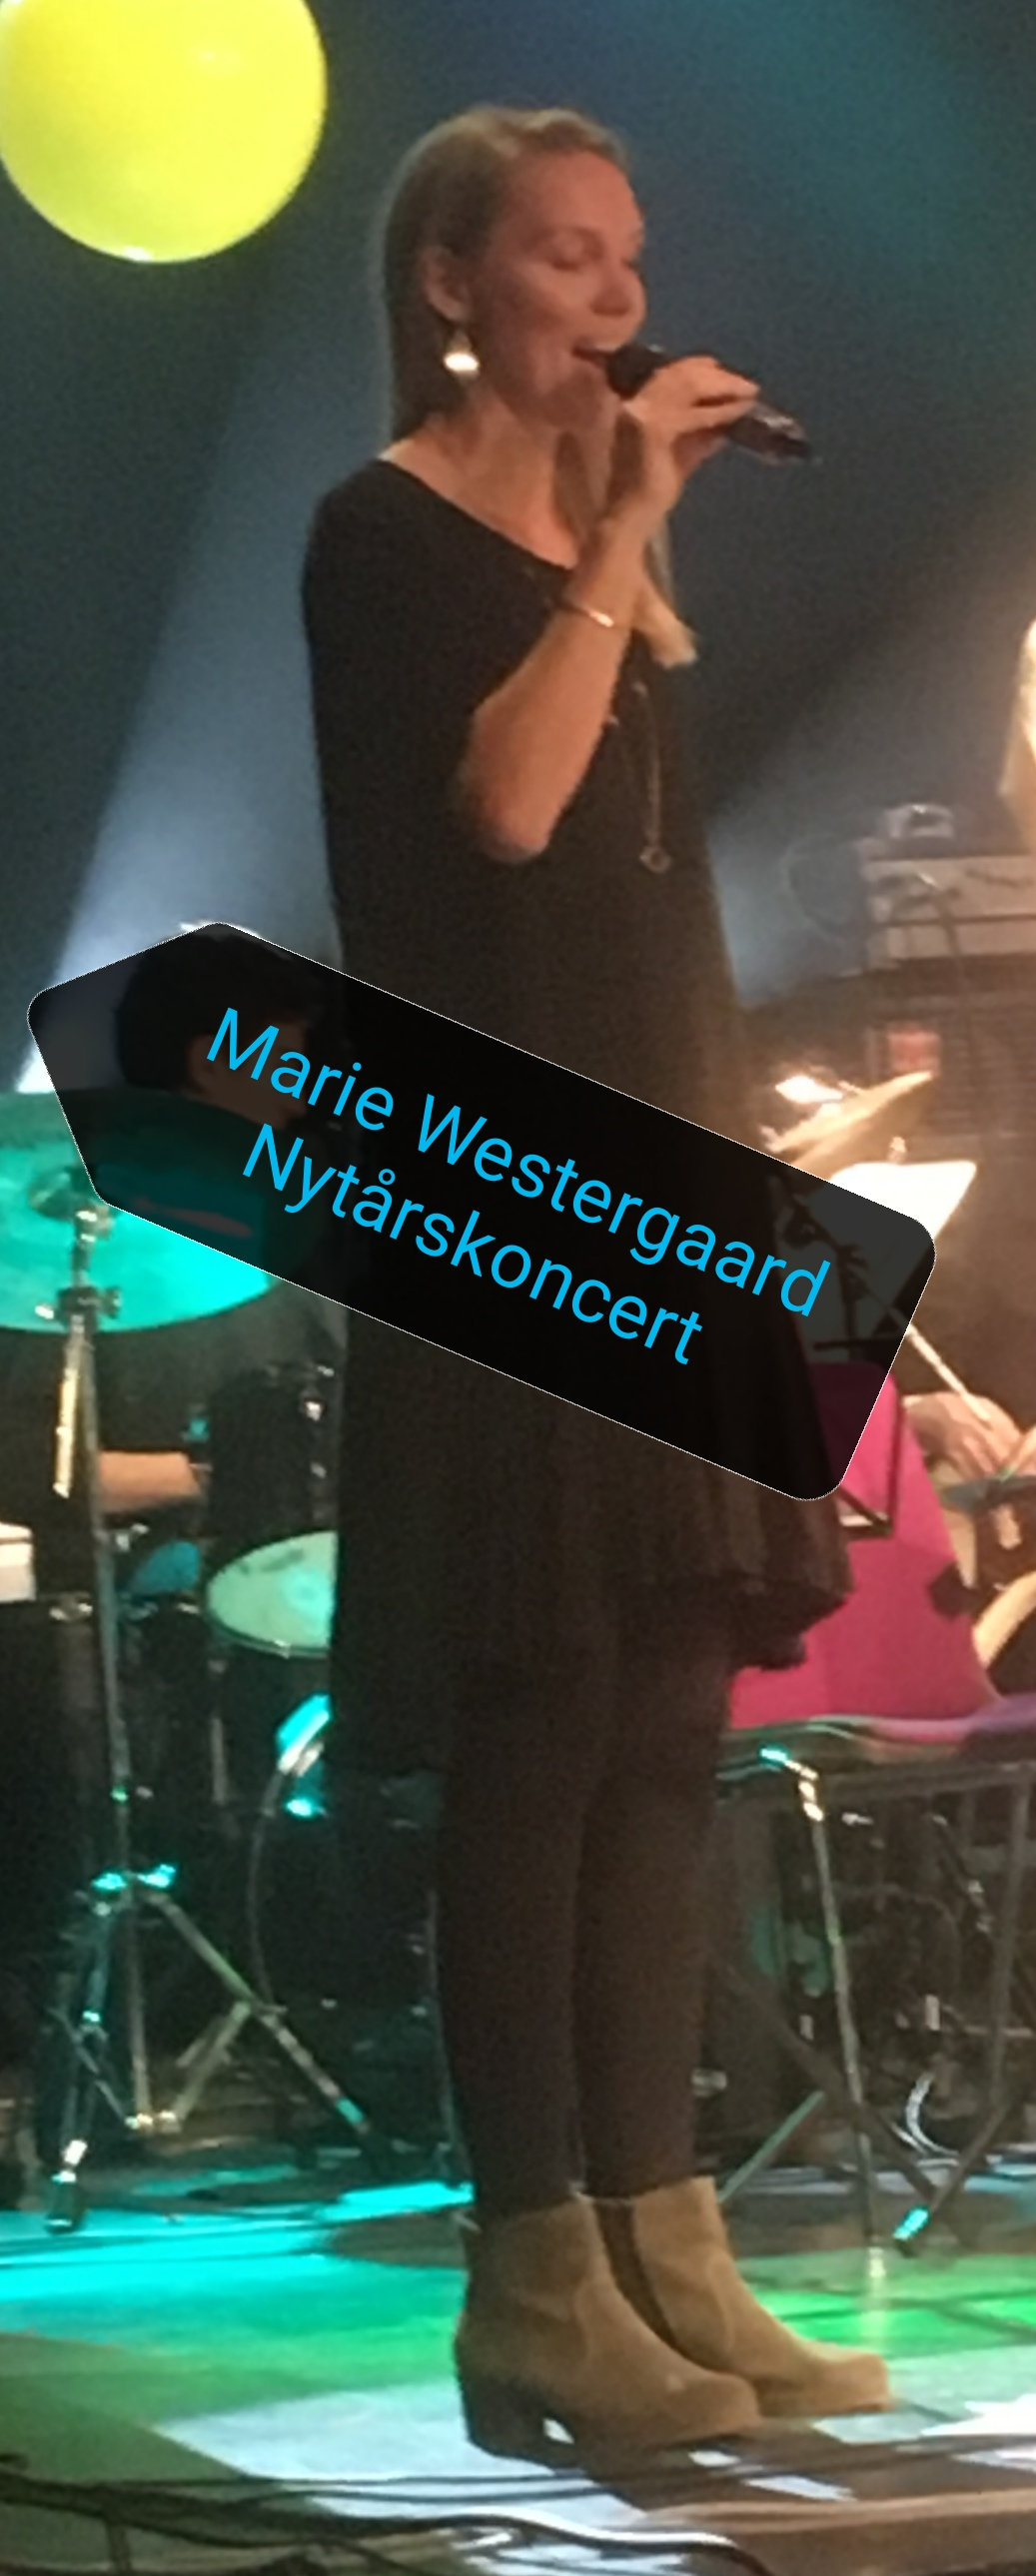 Marie Westergaard synger nytårskoncert